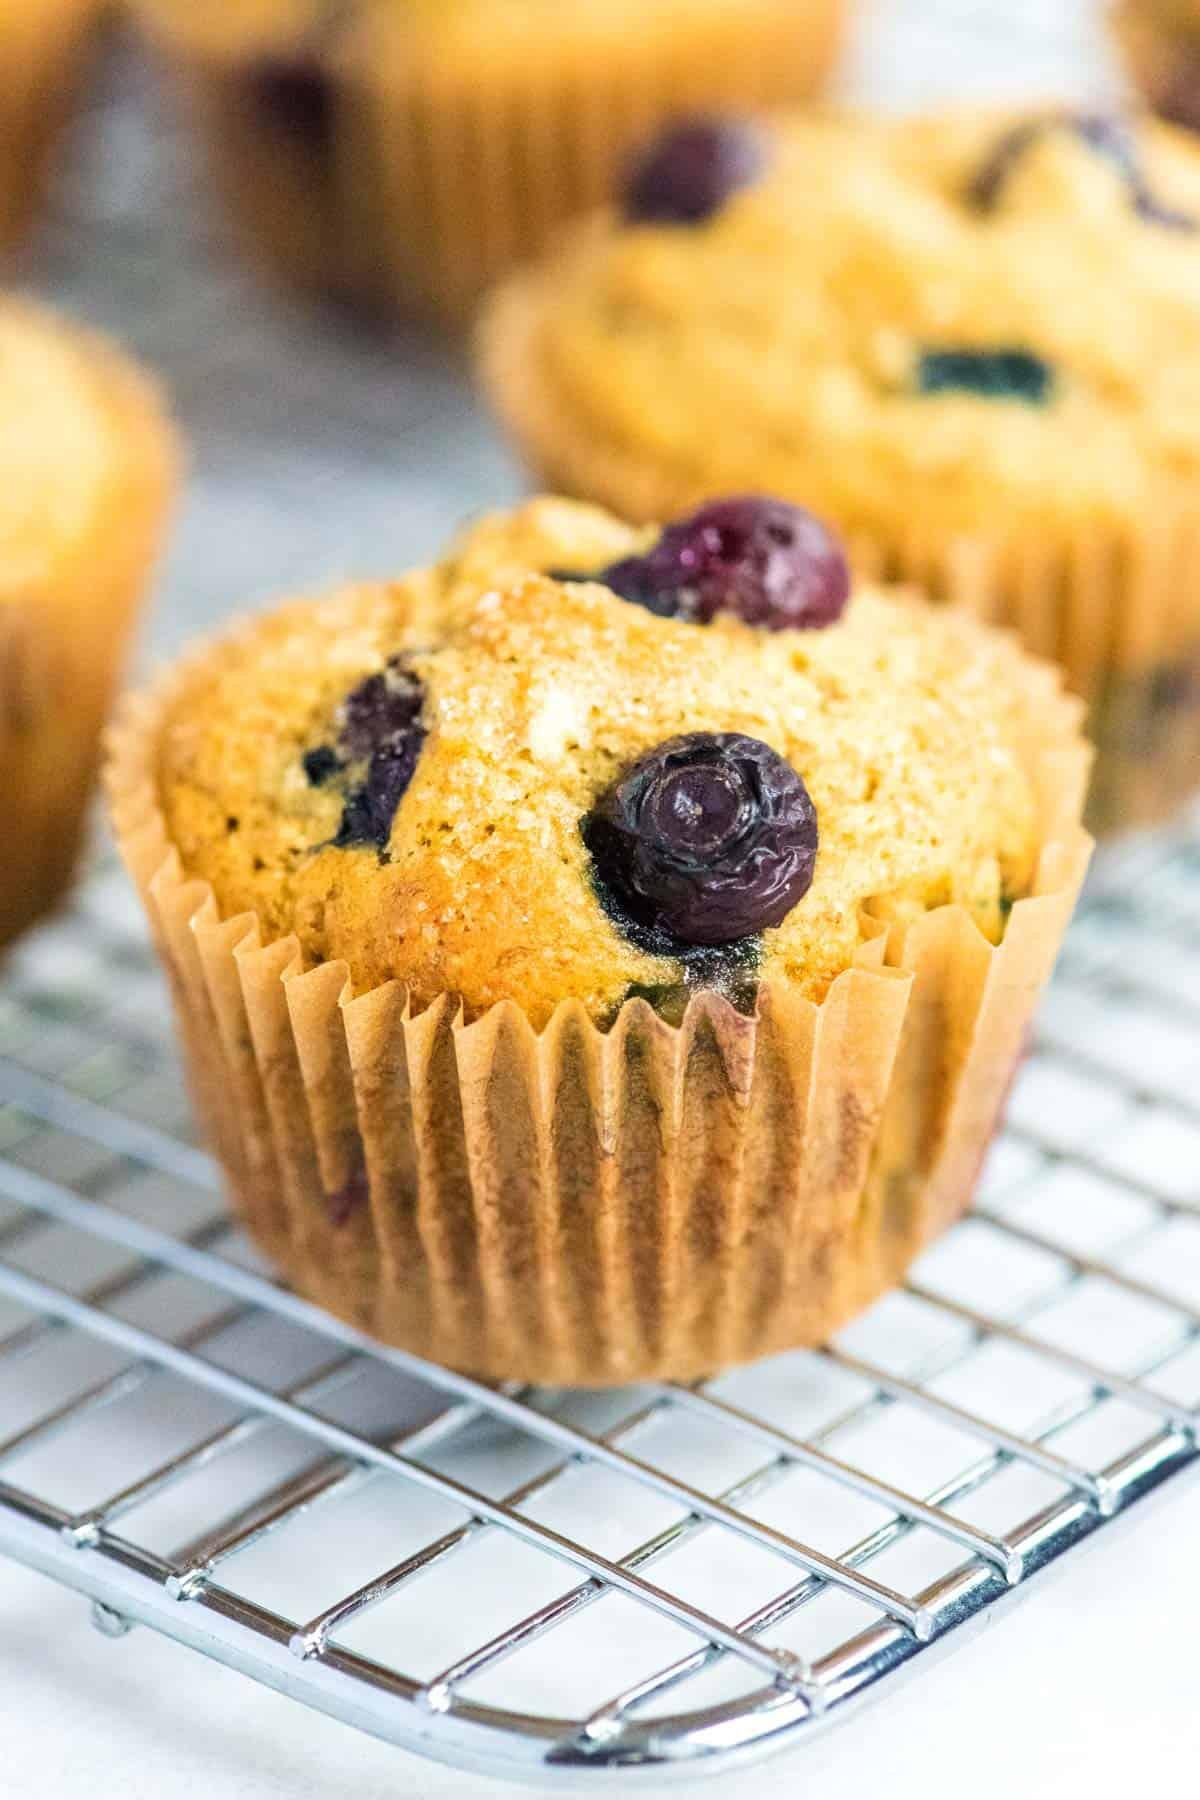 Healthy Banana Muffin Recipes  Healthy Banana Blueberry Muffins Recipe